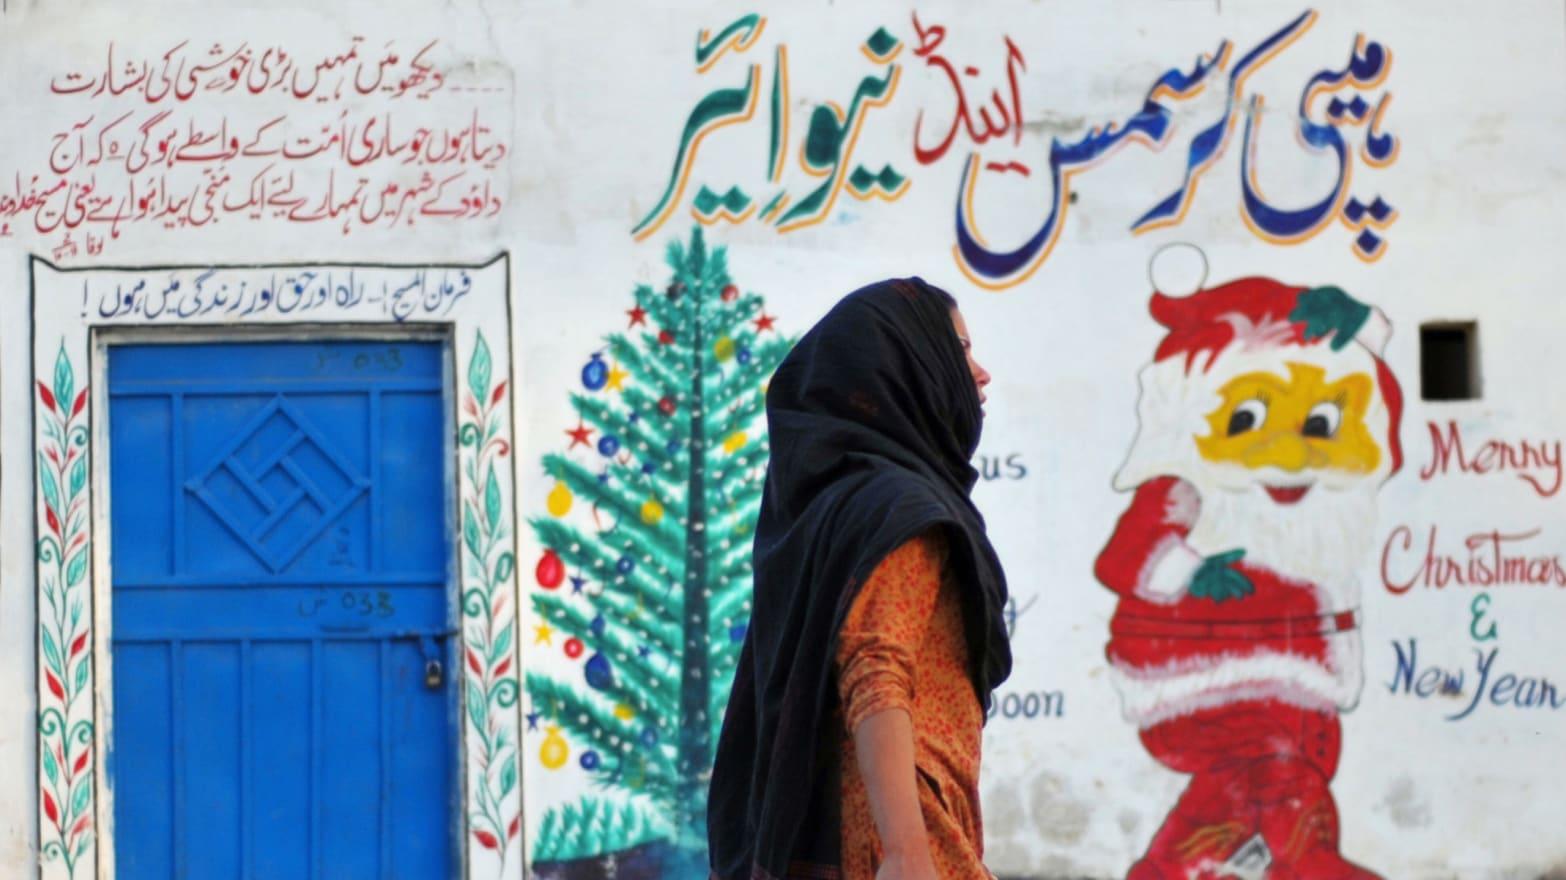 Islam Christmas.Why Muslims Love Jesus Too